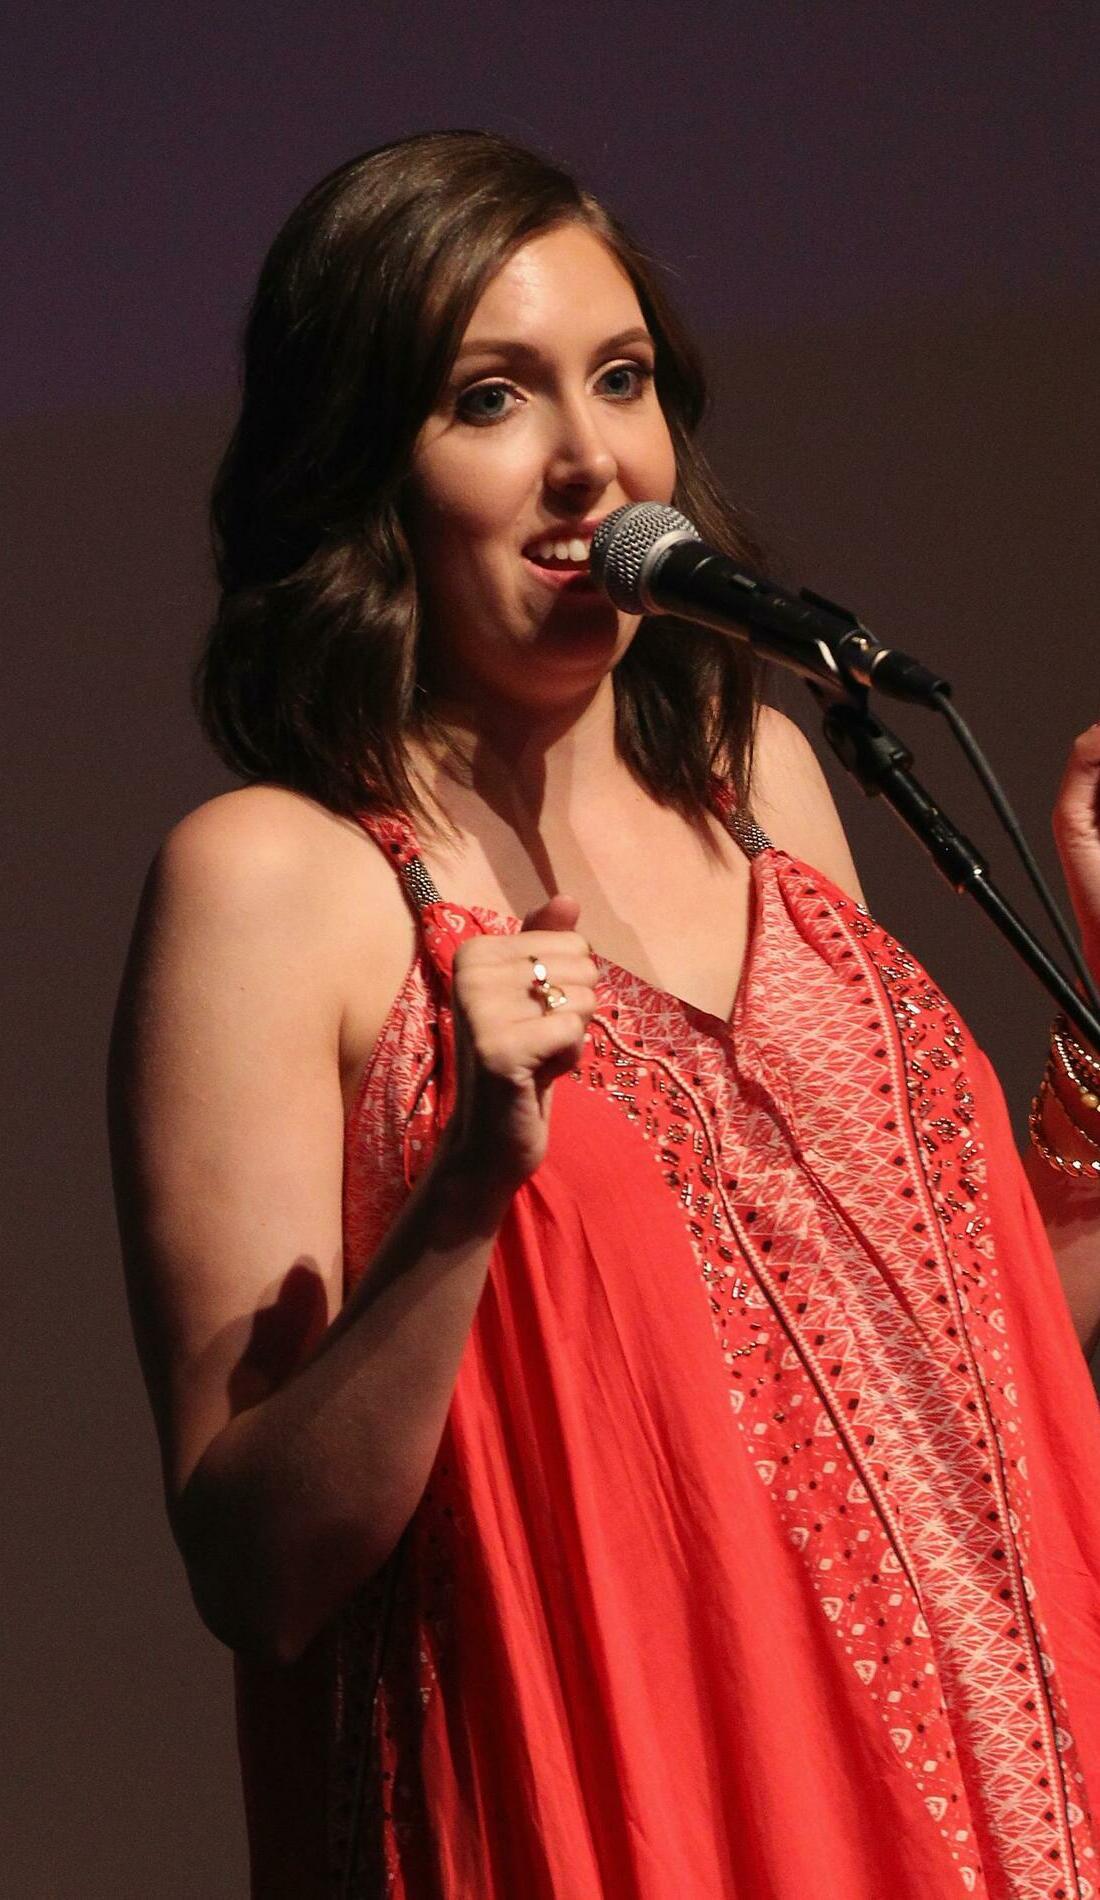 A Francesca Battistelli live event